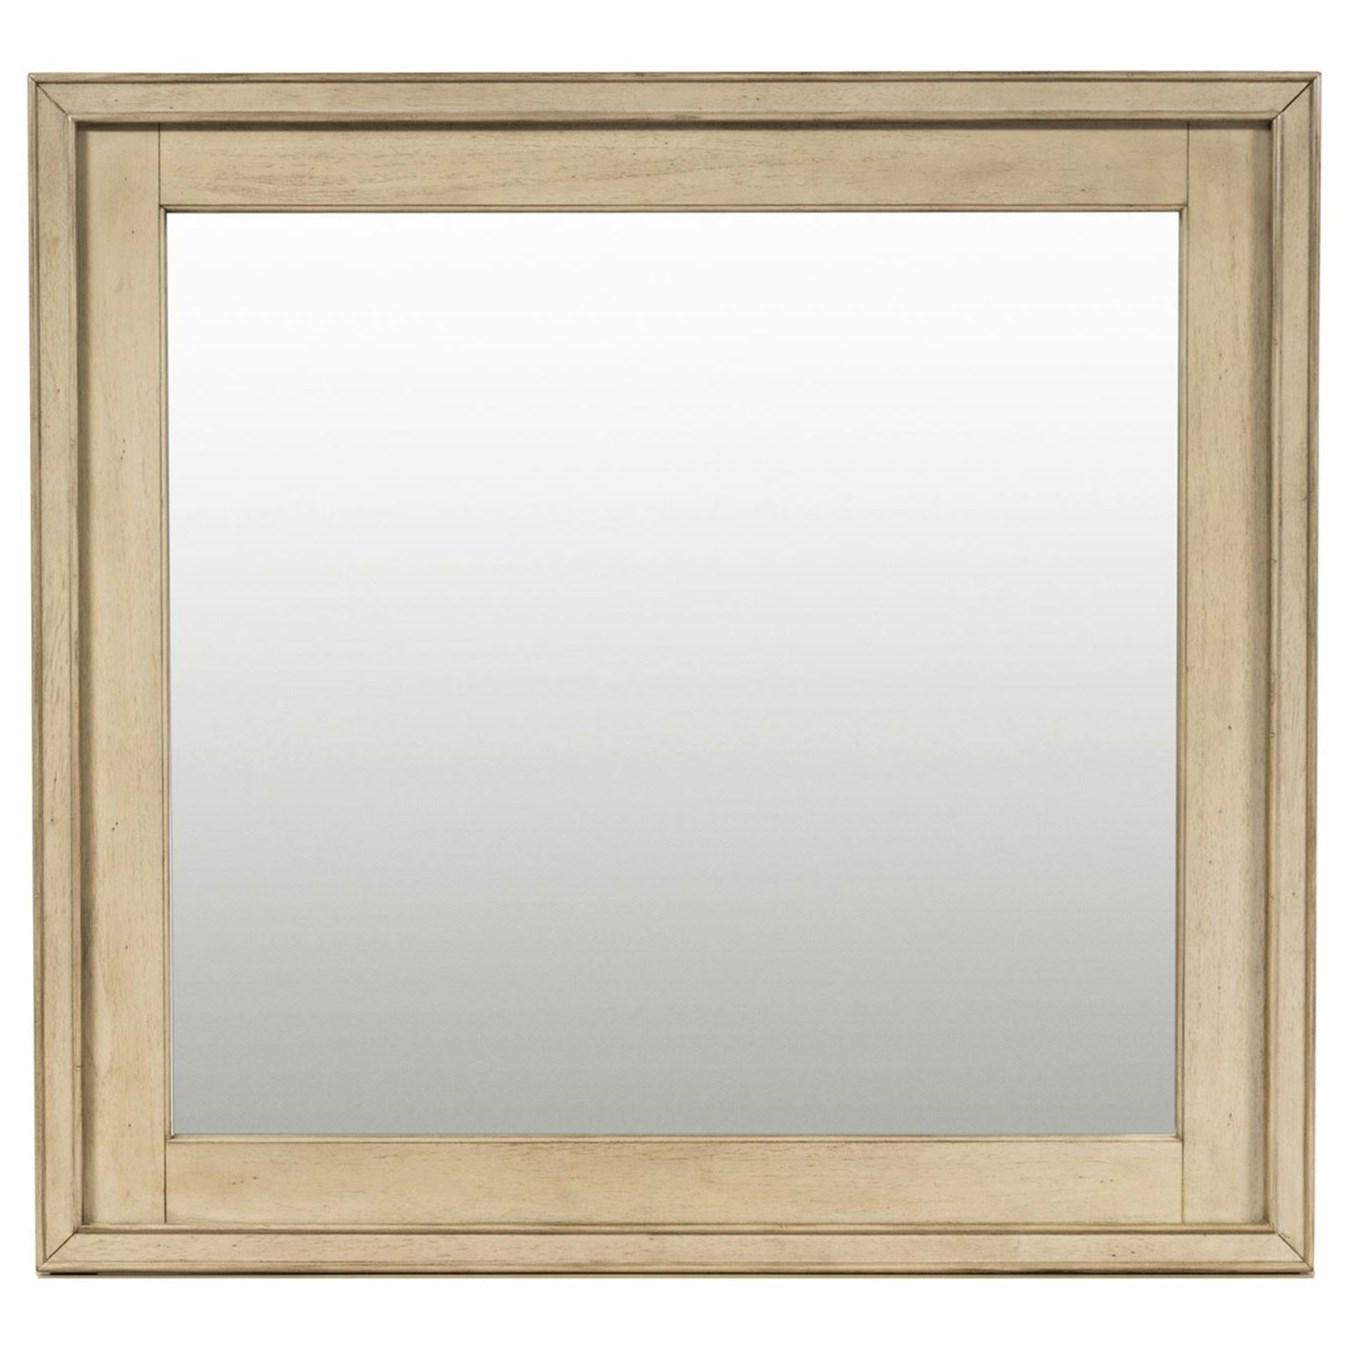 Liberty Furniture 573 Mirror - Item Number: 573-BR51